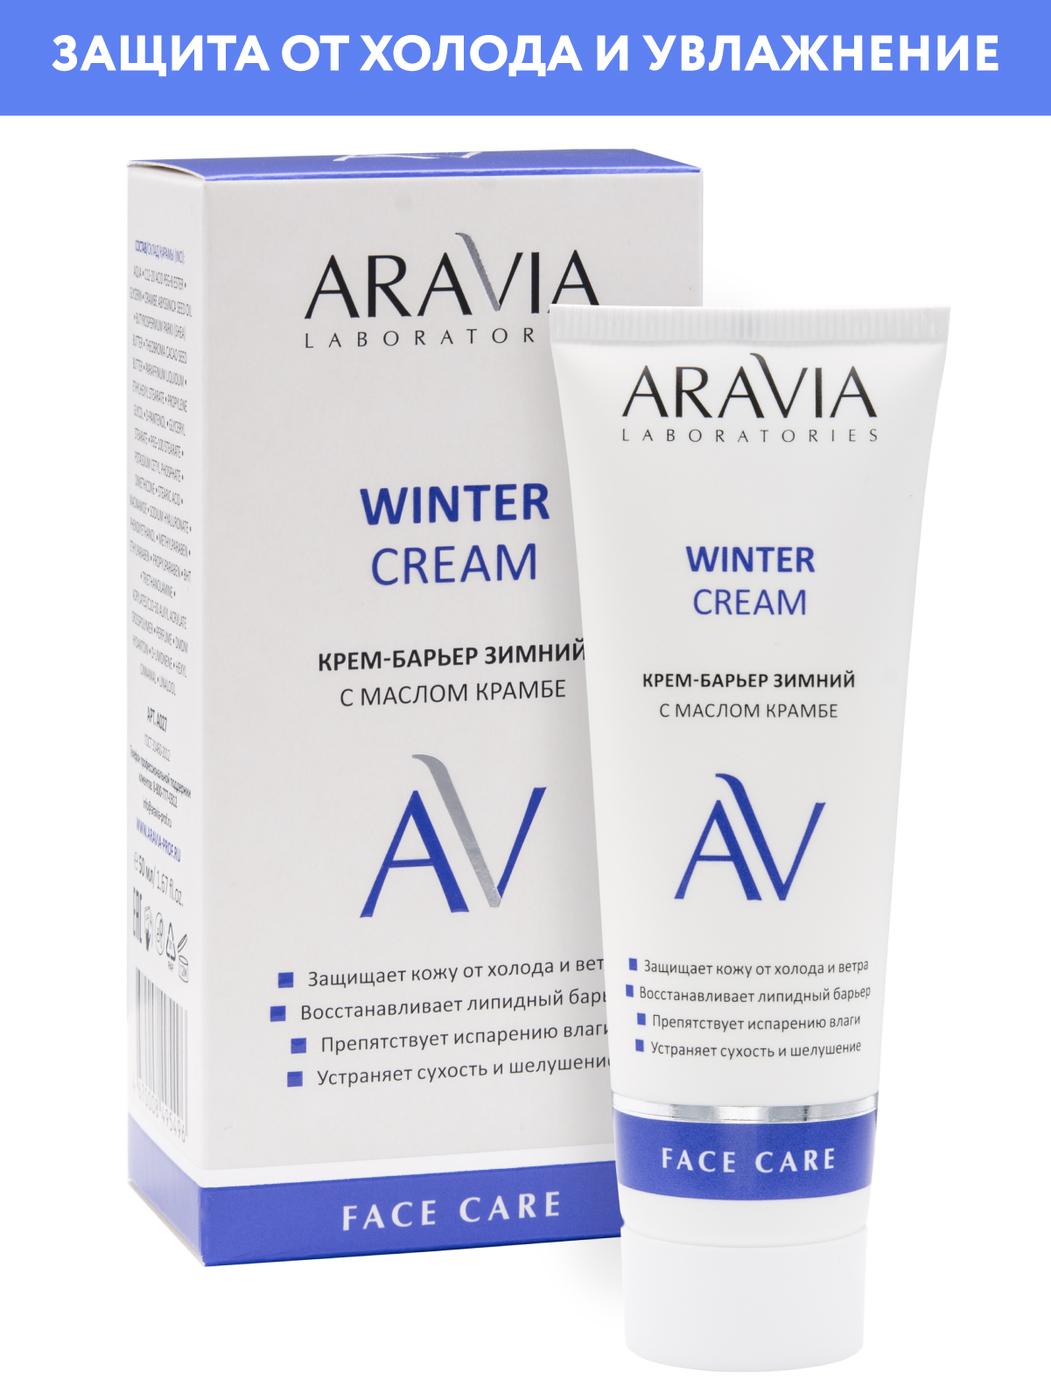 ARAVIA Laboratories Крем-барьер c маслом крамбе Winter Cream, 50 мл